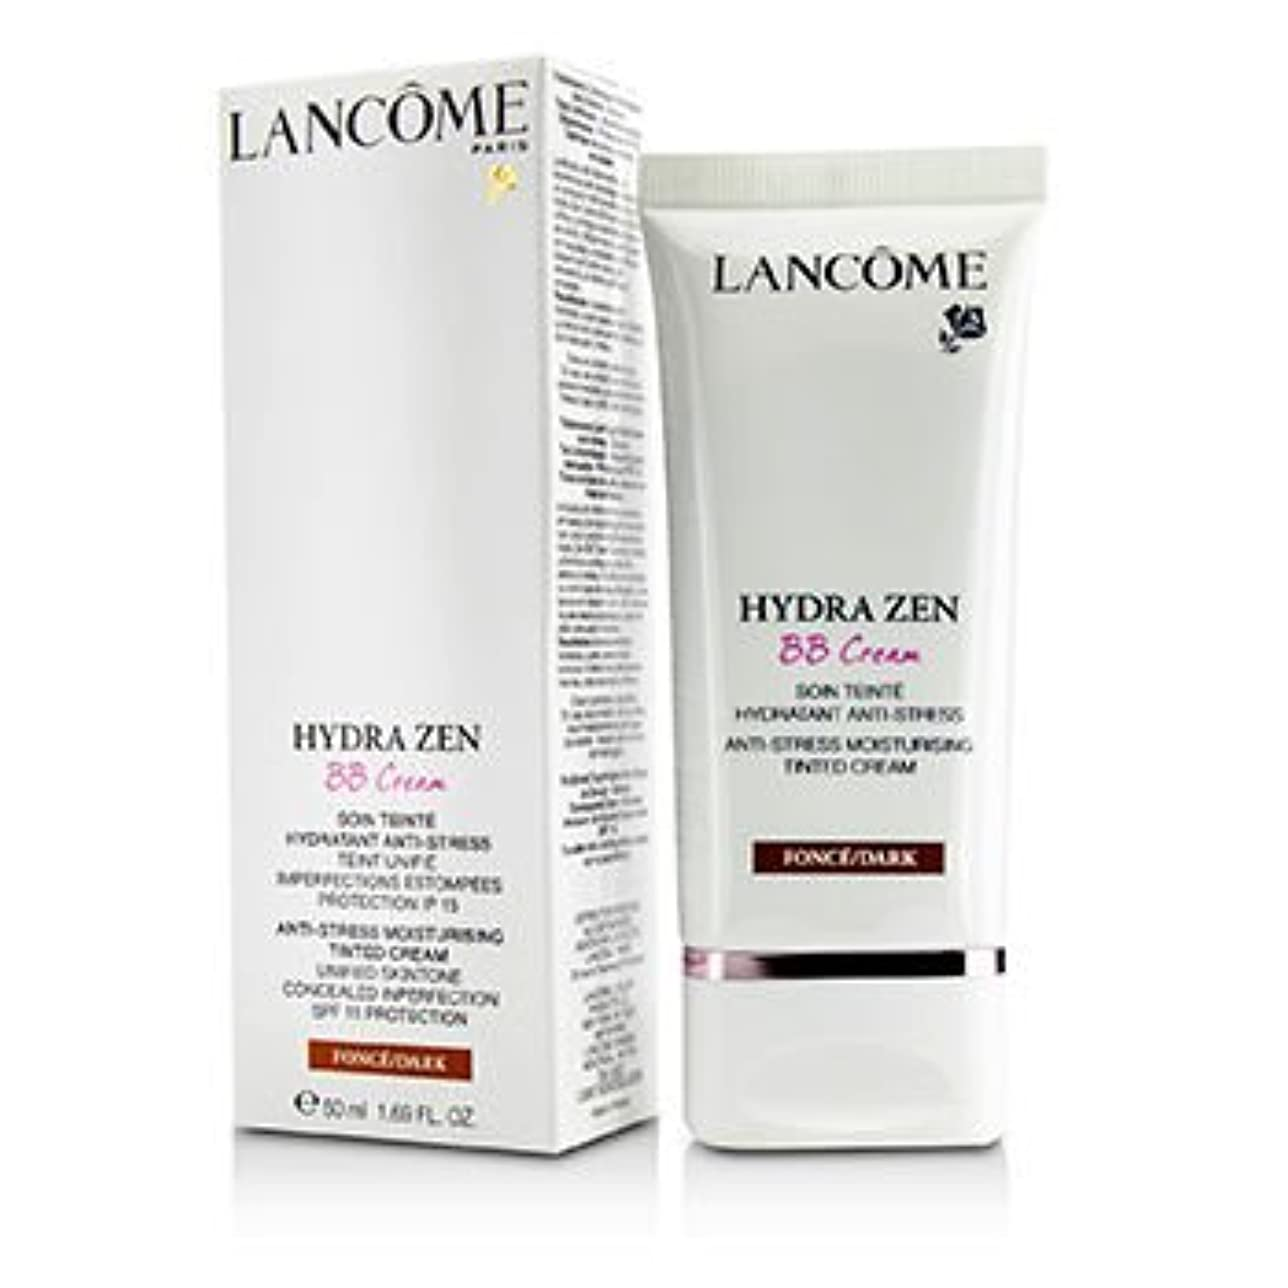 暫定特権思慮深い[Lancome] Lancome Hydra Zen (BB Cream) Anti-Stress Moisturising Tinted Cream SPF 15 - # Dark 50ml/1.69oz